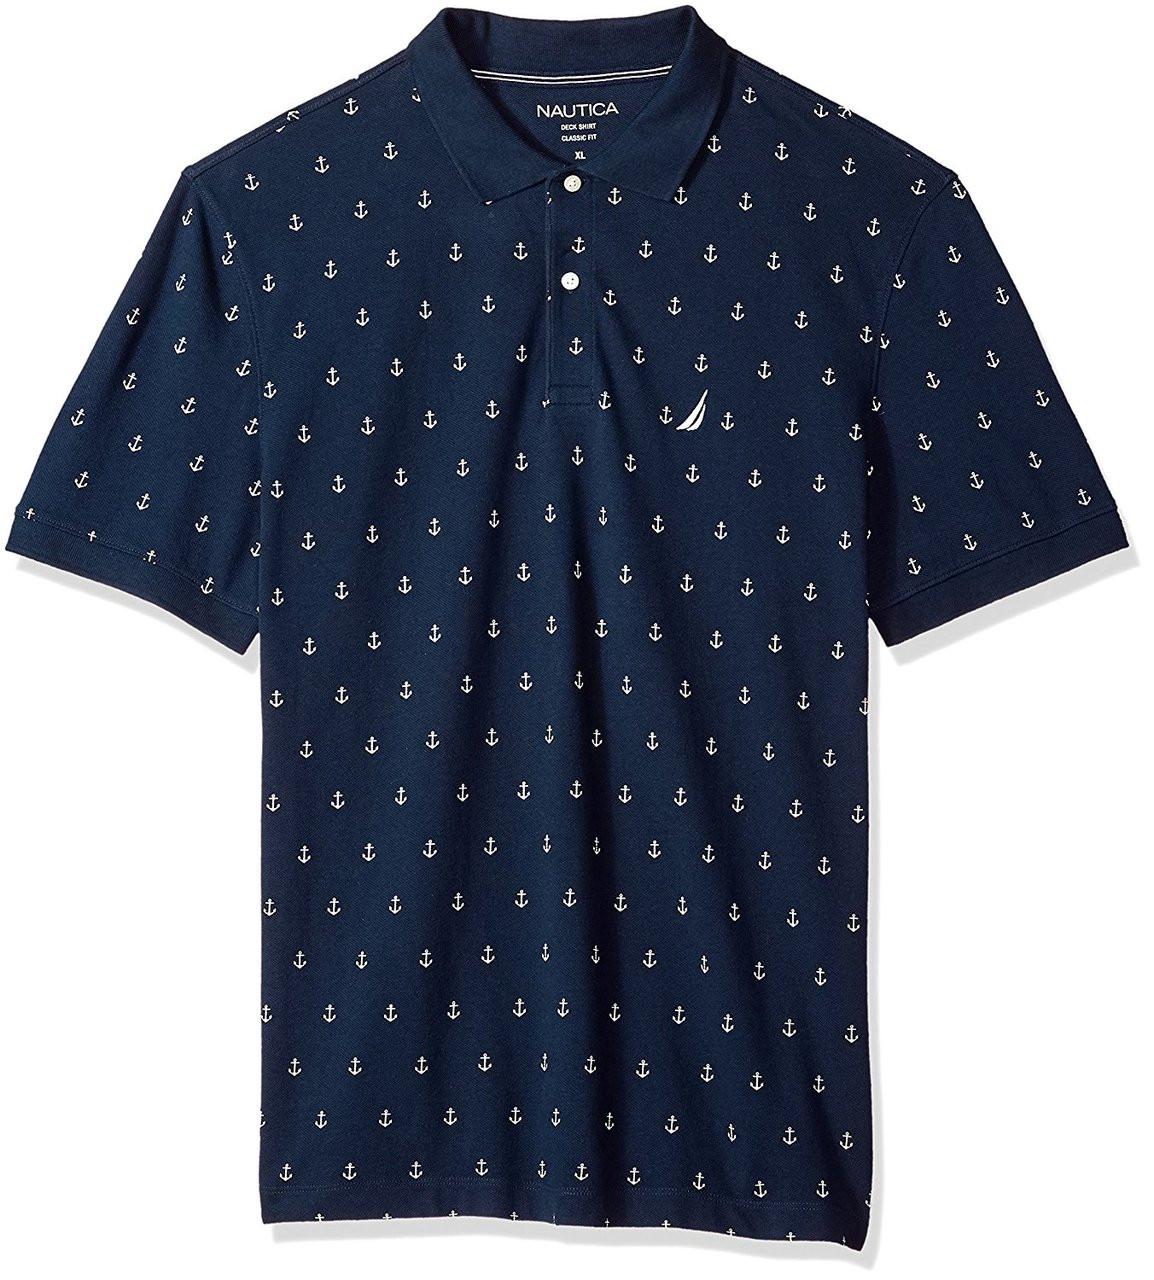 Nautica Short Sleeve Classic Polo Shirt Dick Anthony Ltd